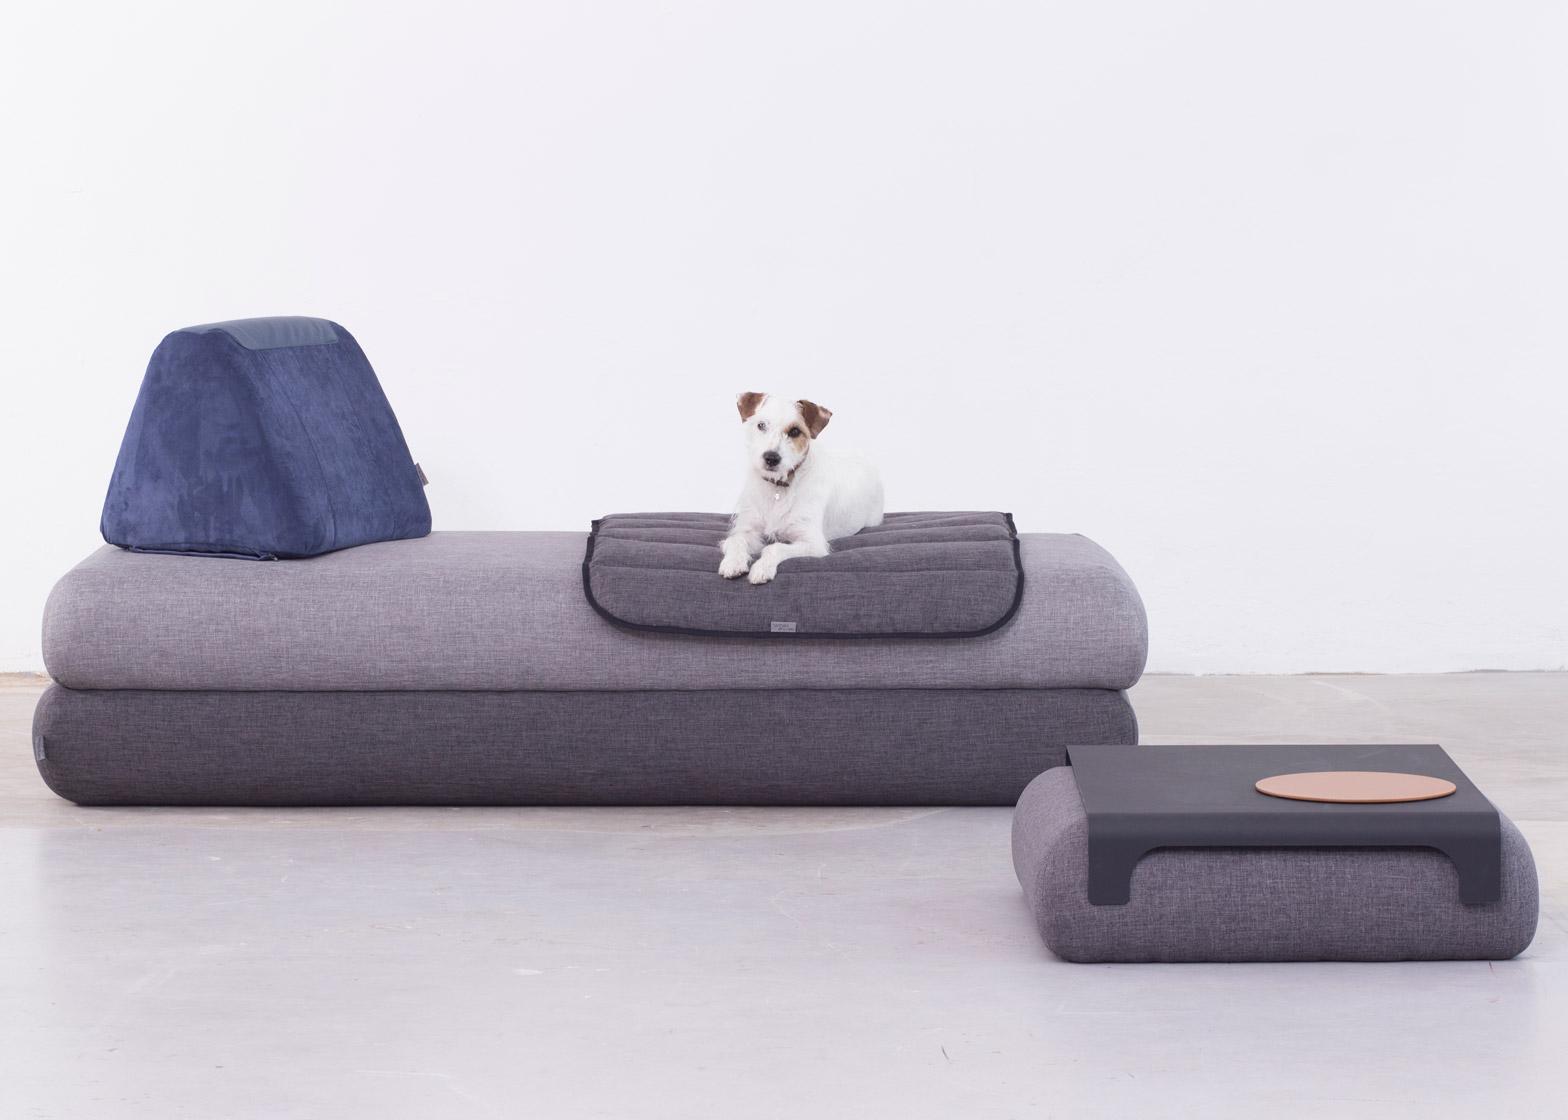 sofa design 11 of 11; urban nomad sofa designed by anikó rácz for AMWQOMC